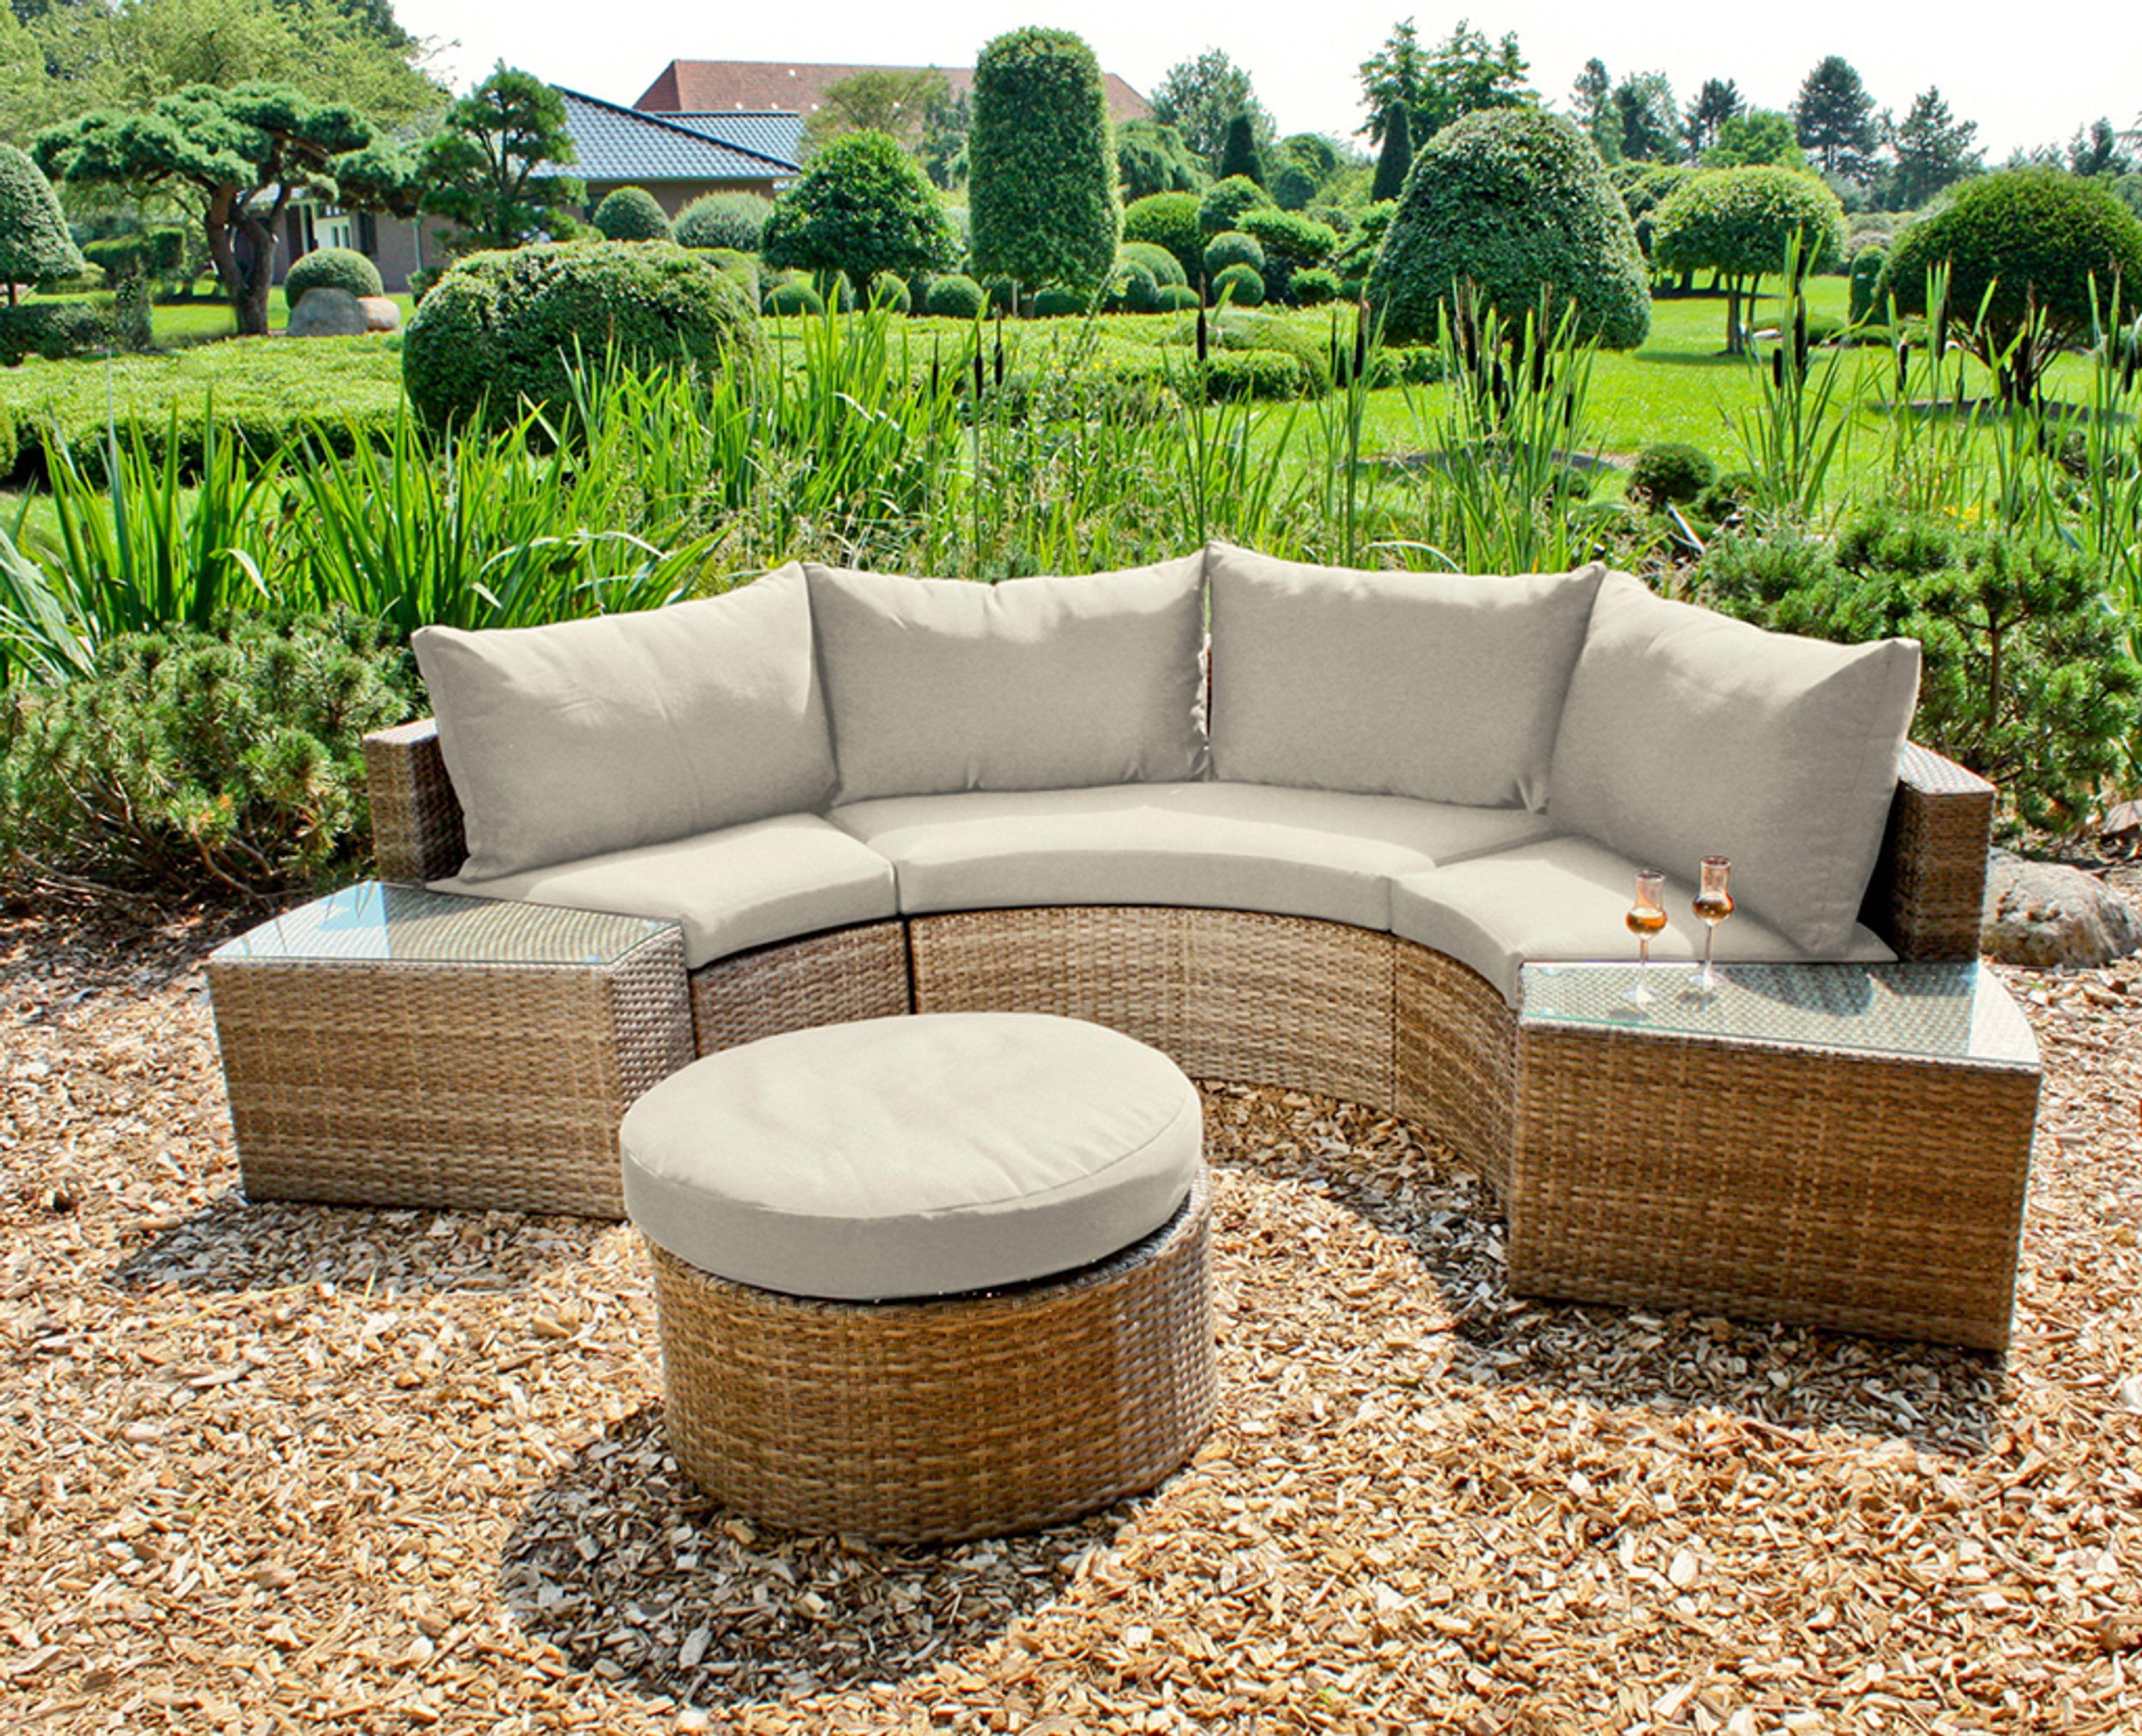 Garten Sofa Couch Sitzgruppe Sitzecke Tischgruppe Loungegruppe